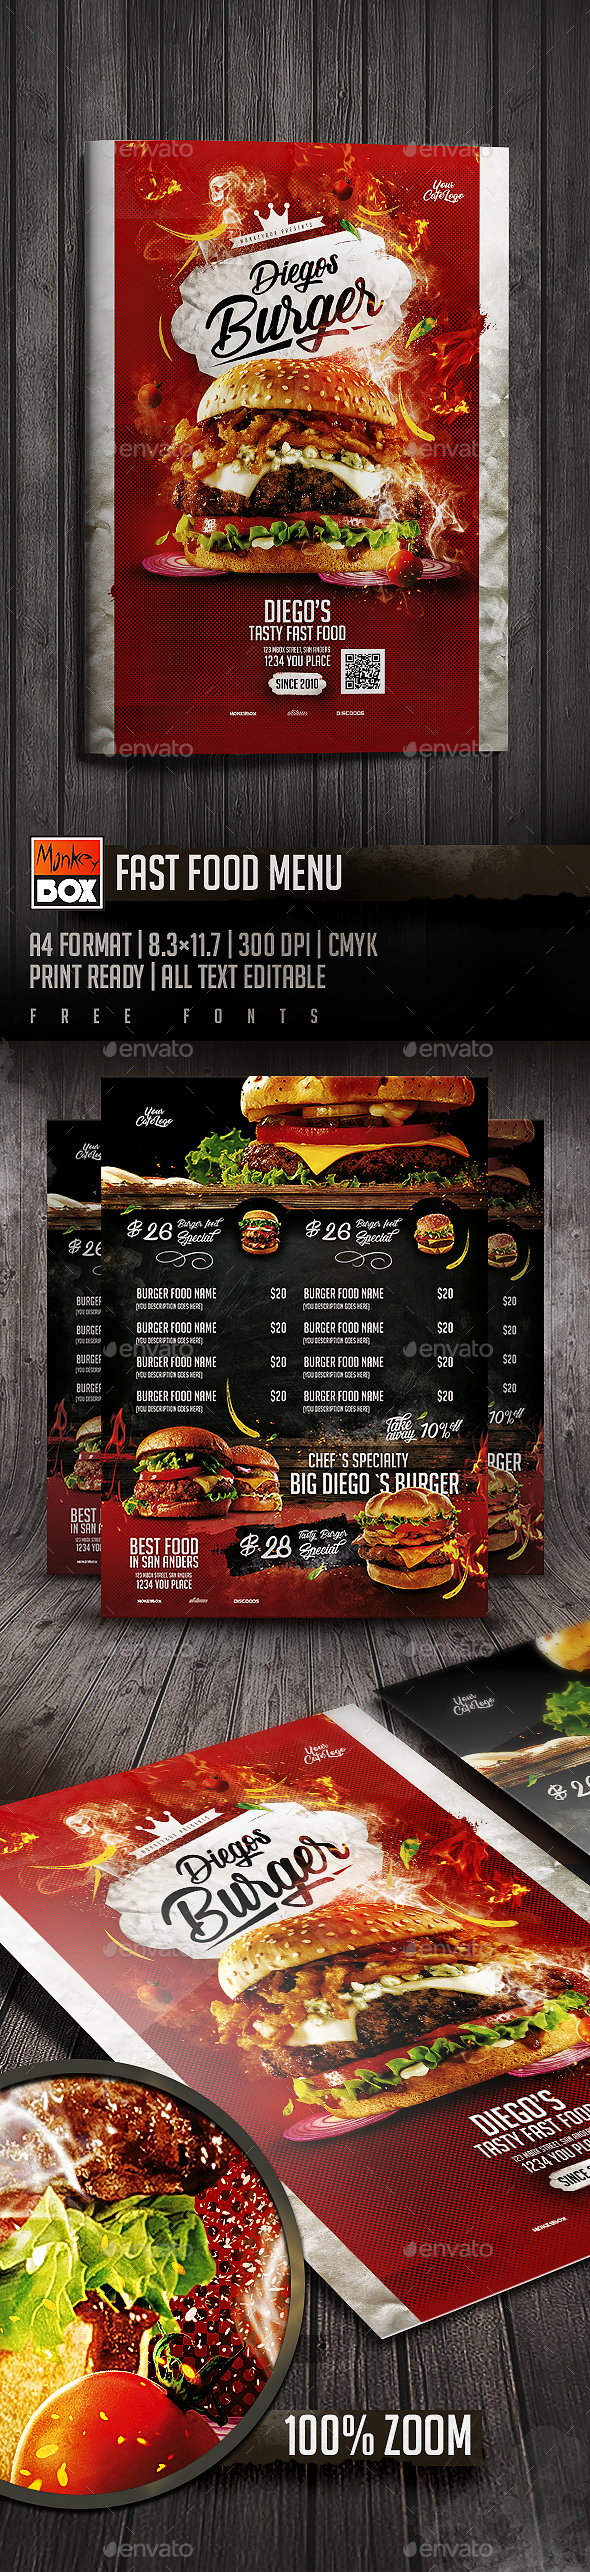 Fast Food Menu - Restaurant Flyers